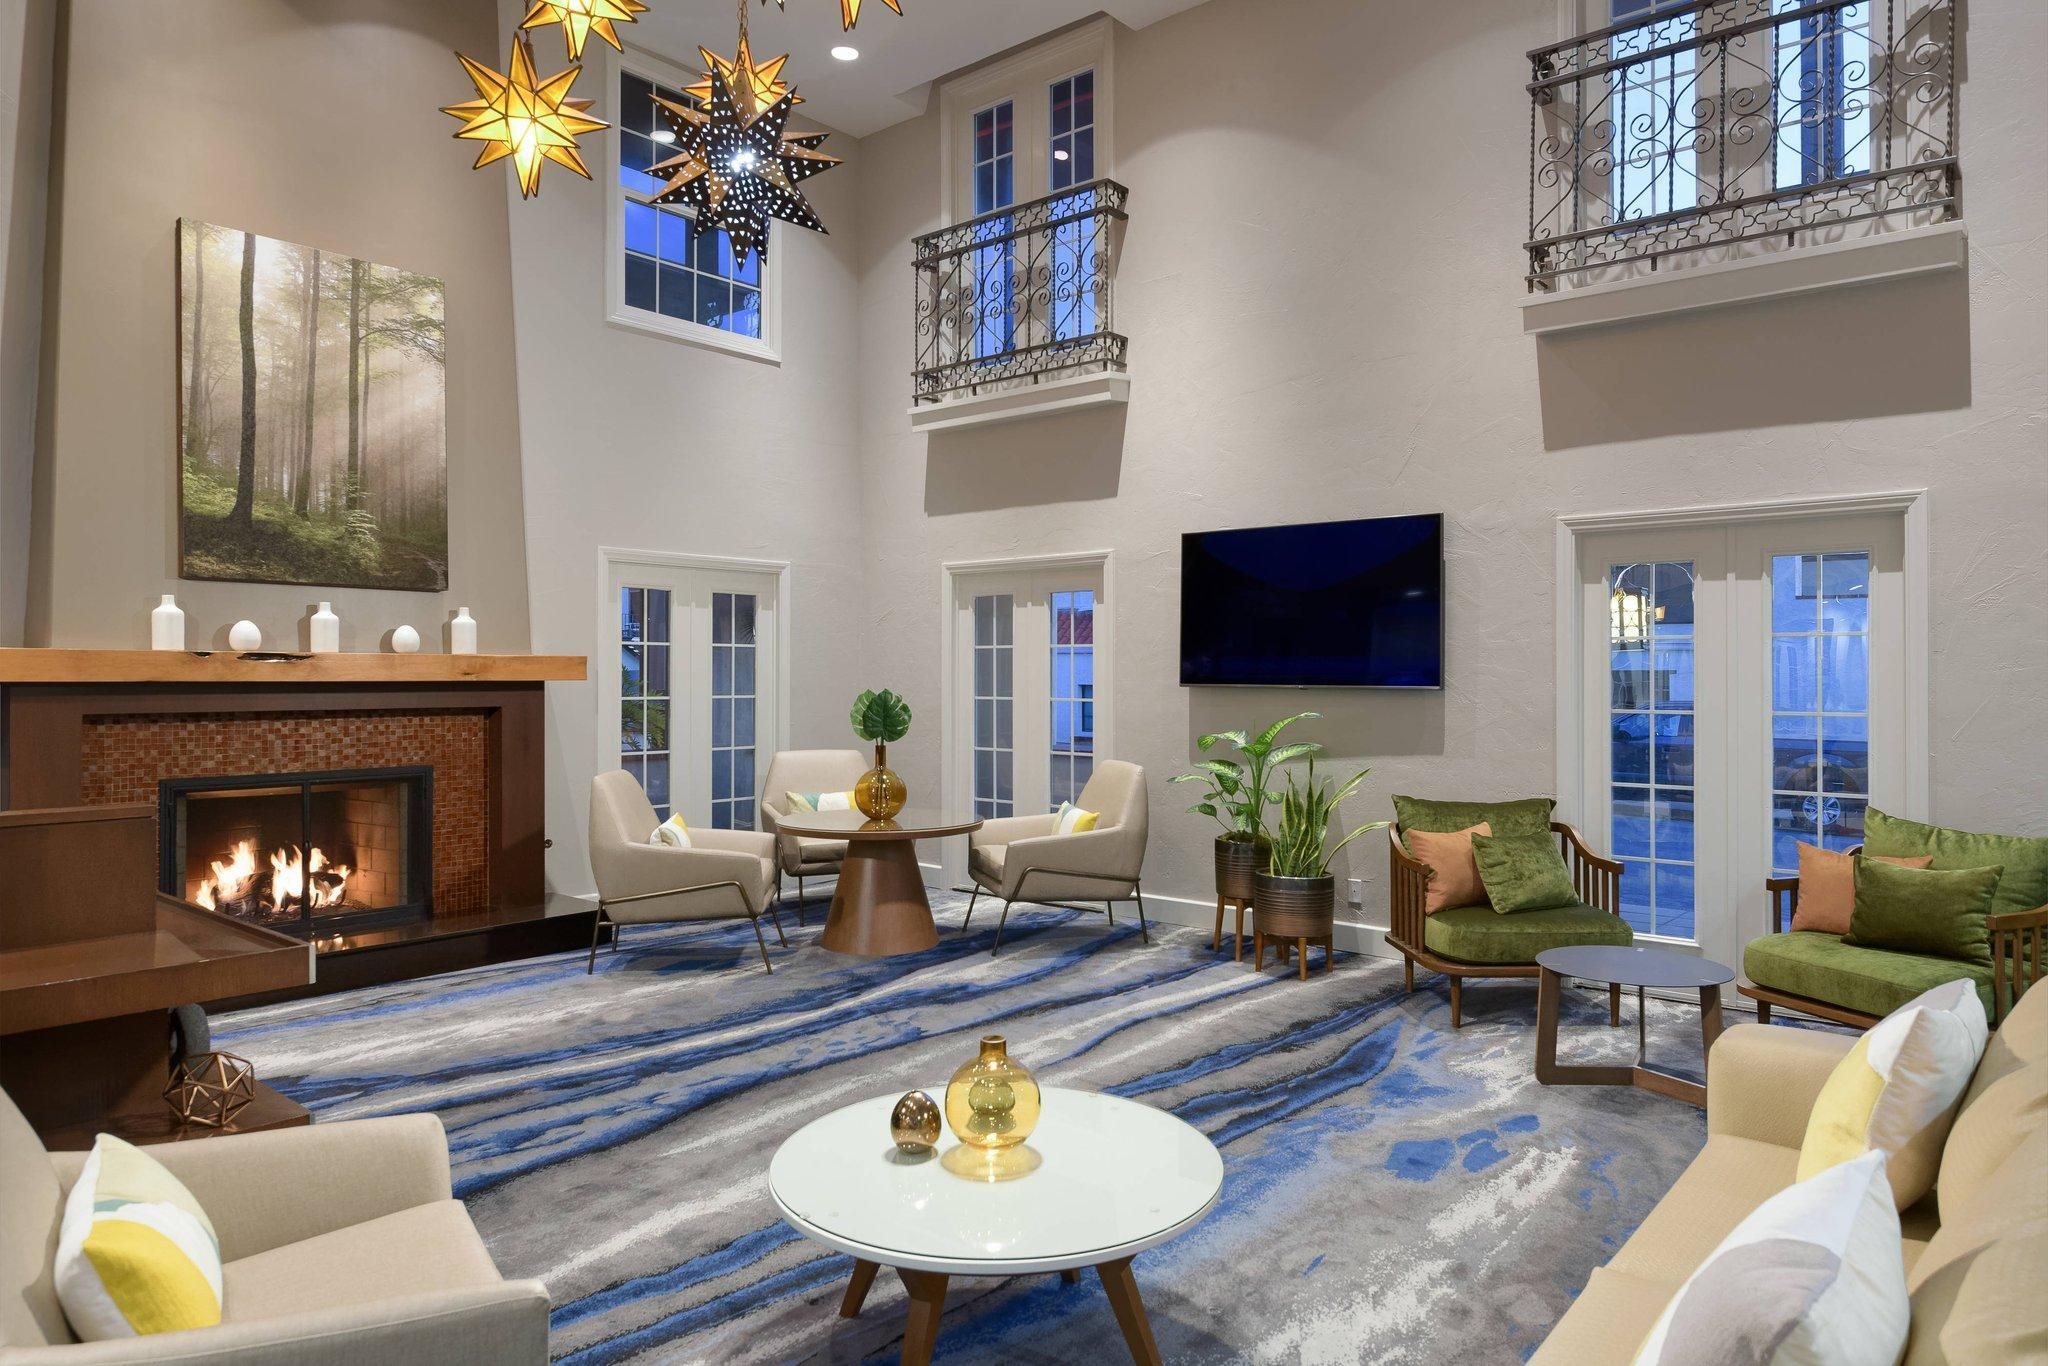 Fairfield Inn And Suites San Diego Old Town